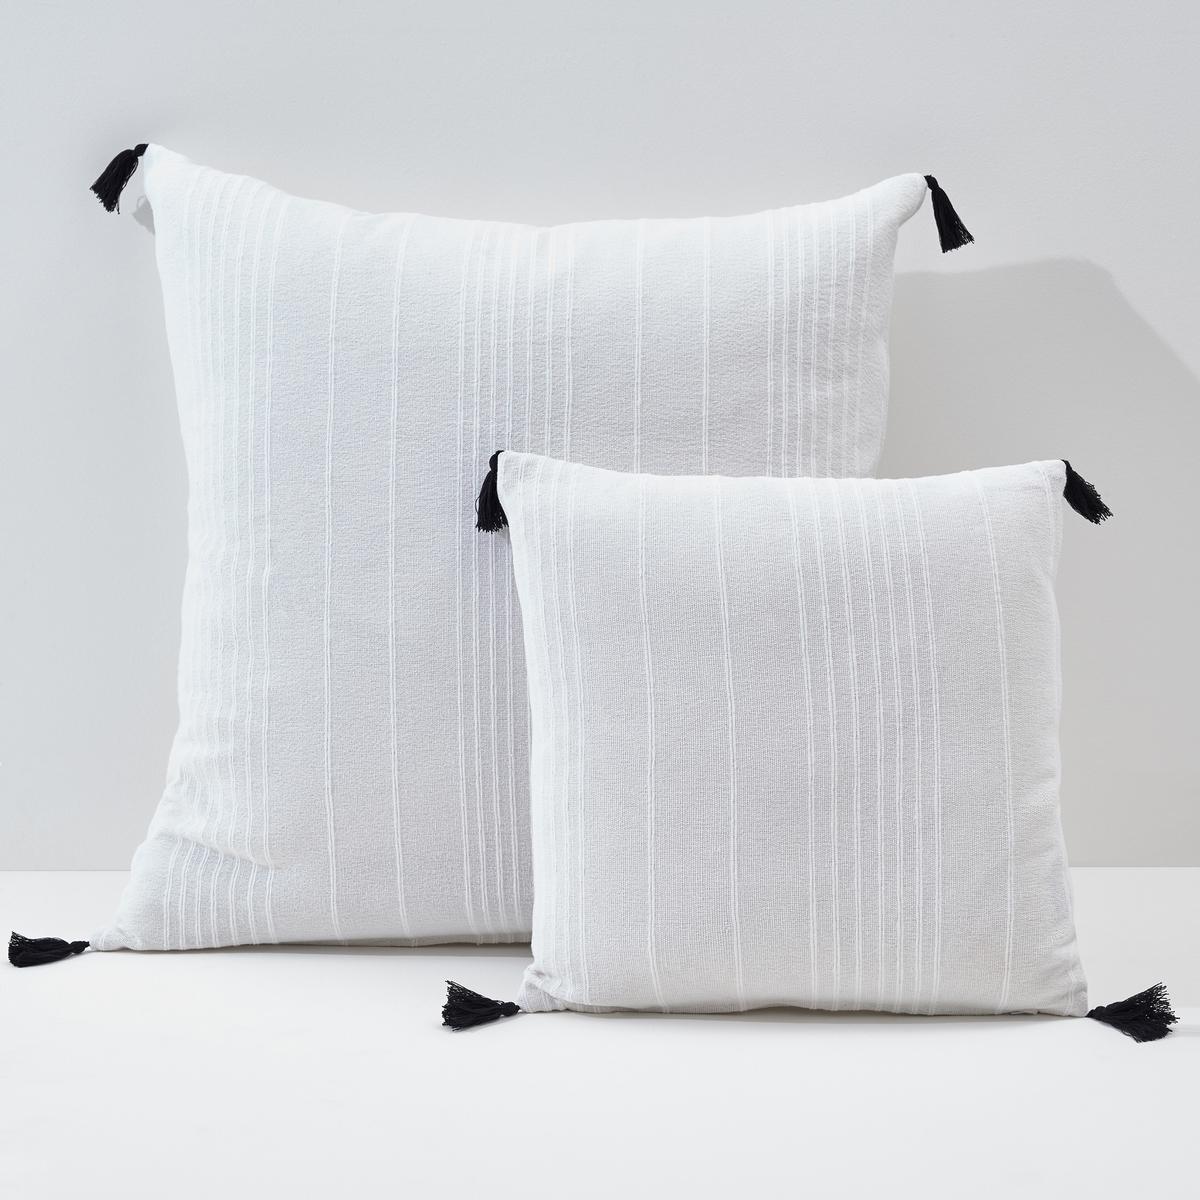 Чехол однотонный для подушки с помпонами, Riad